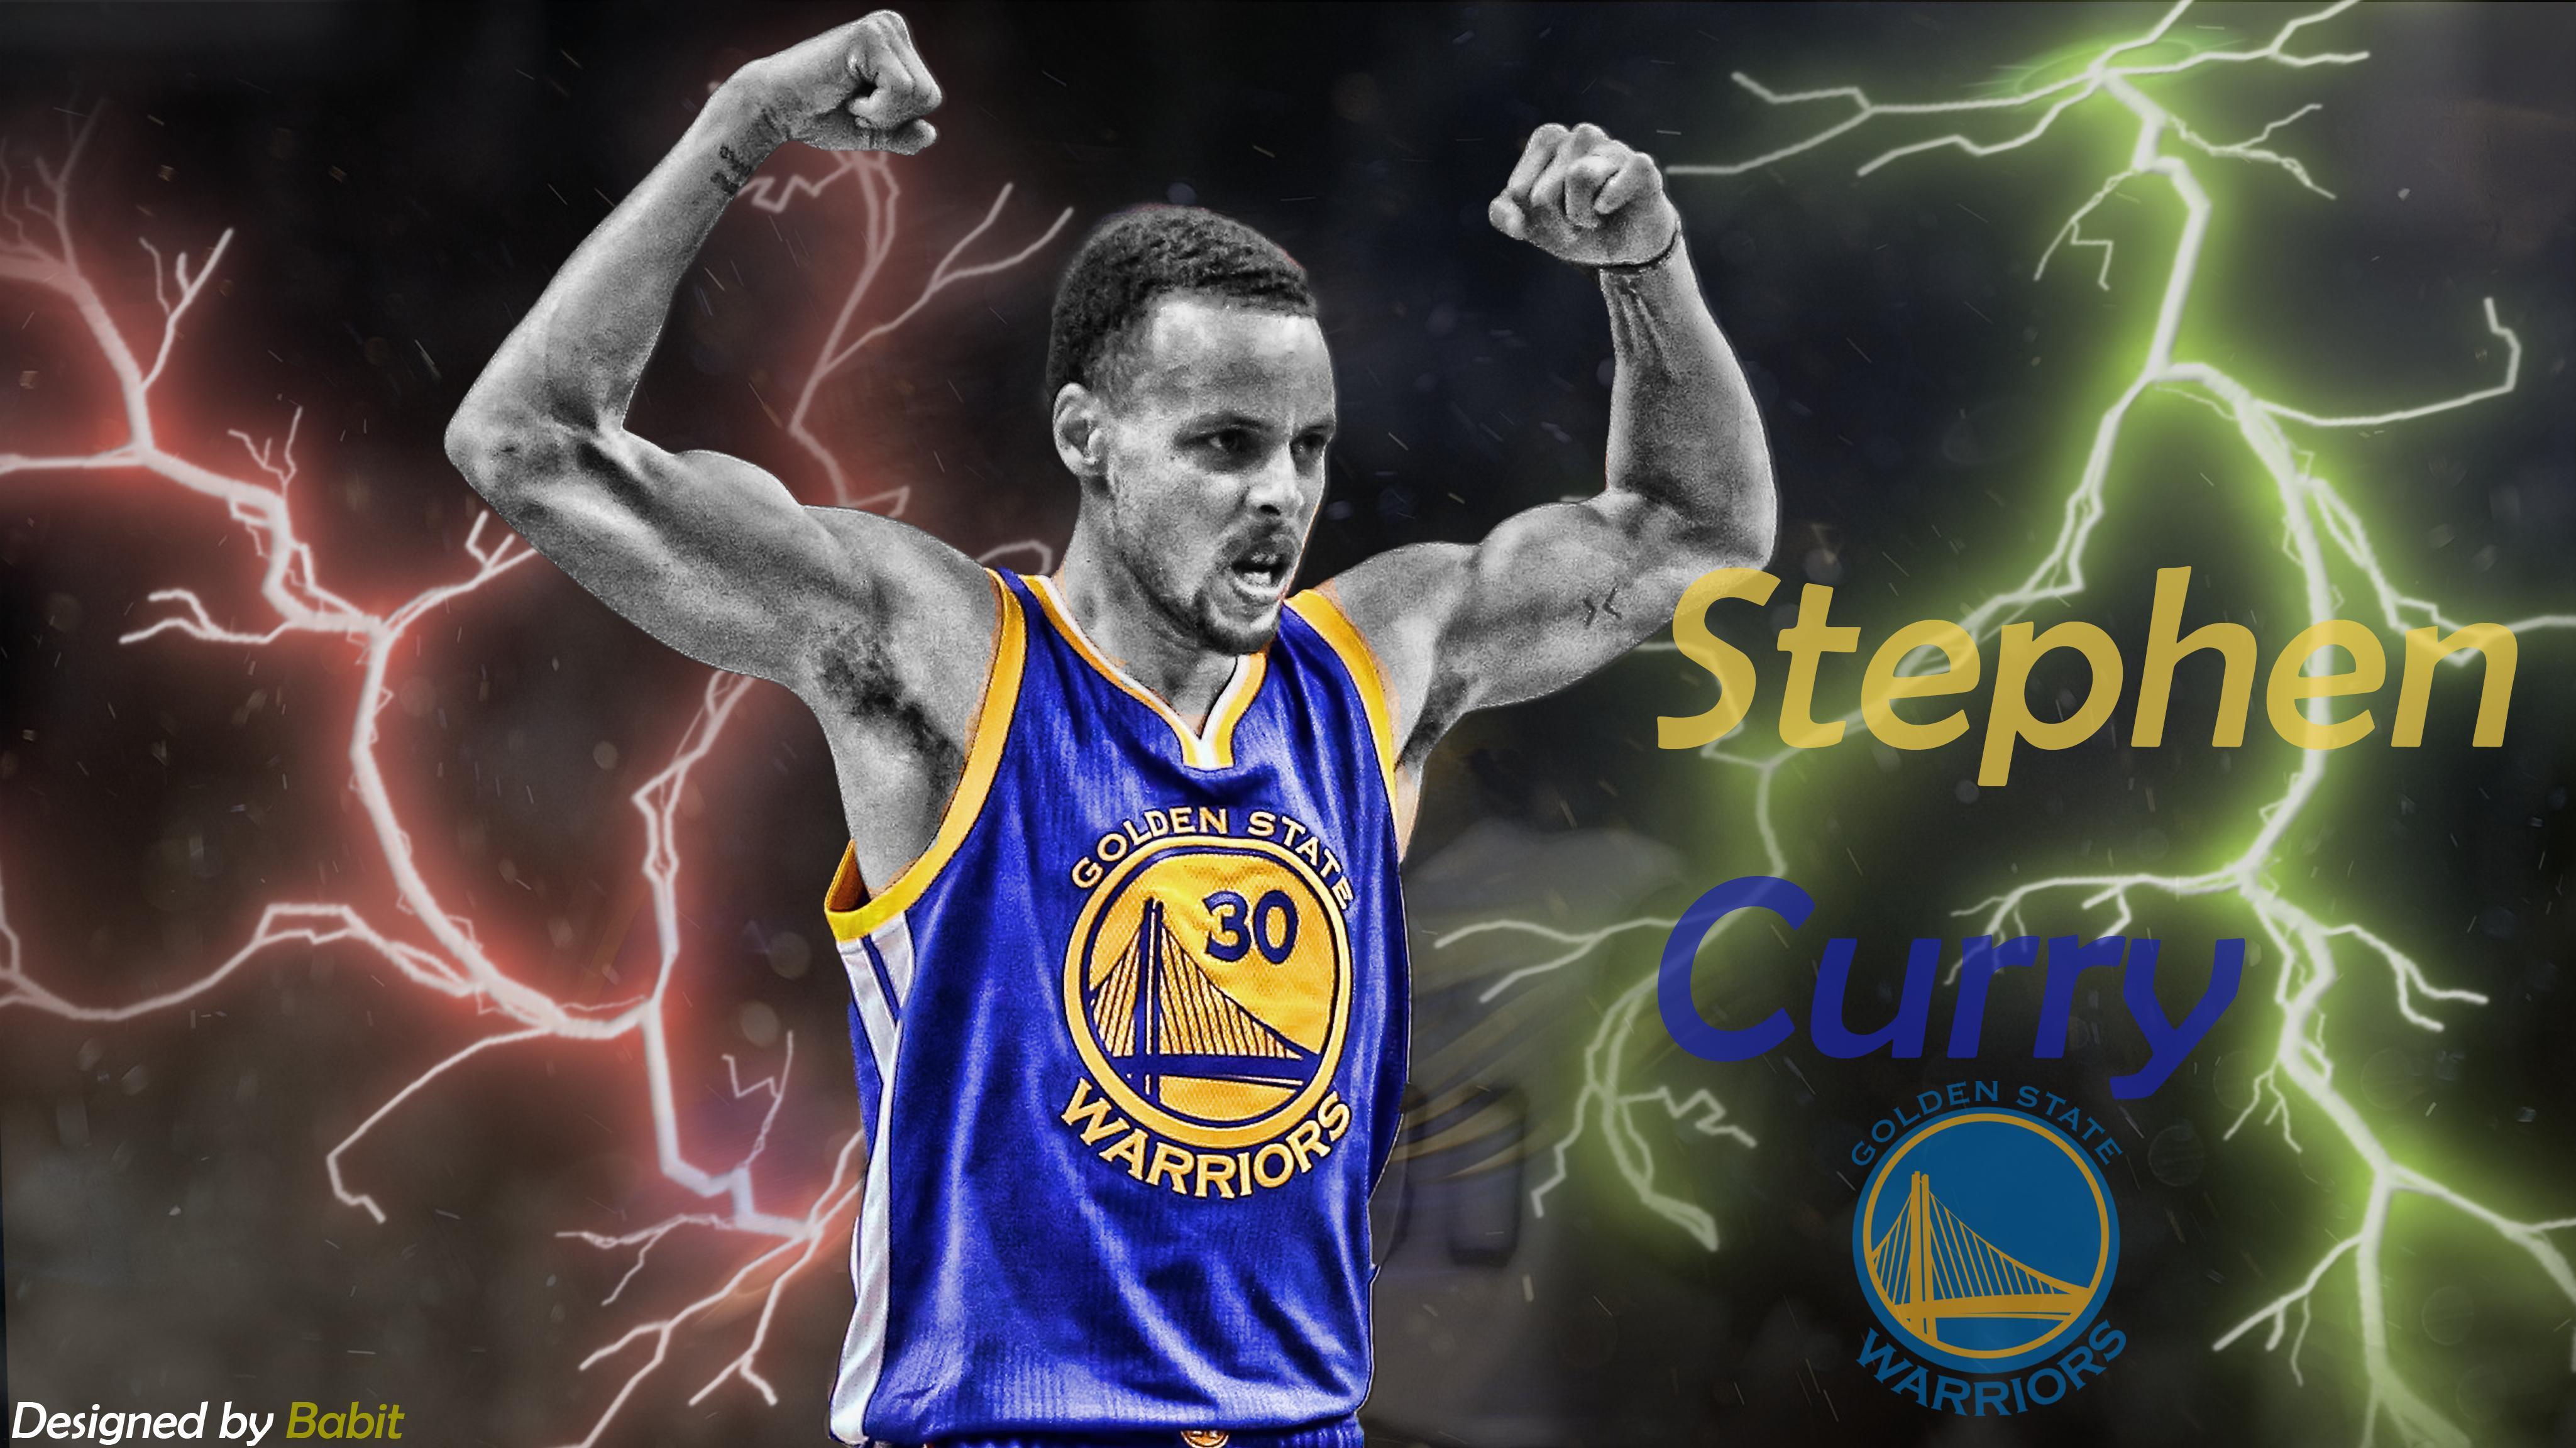 Top Free 4k Nba Backgrounds: Top Free 4K NBA Backgrounds